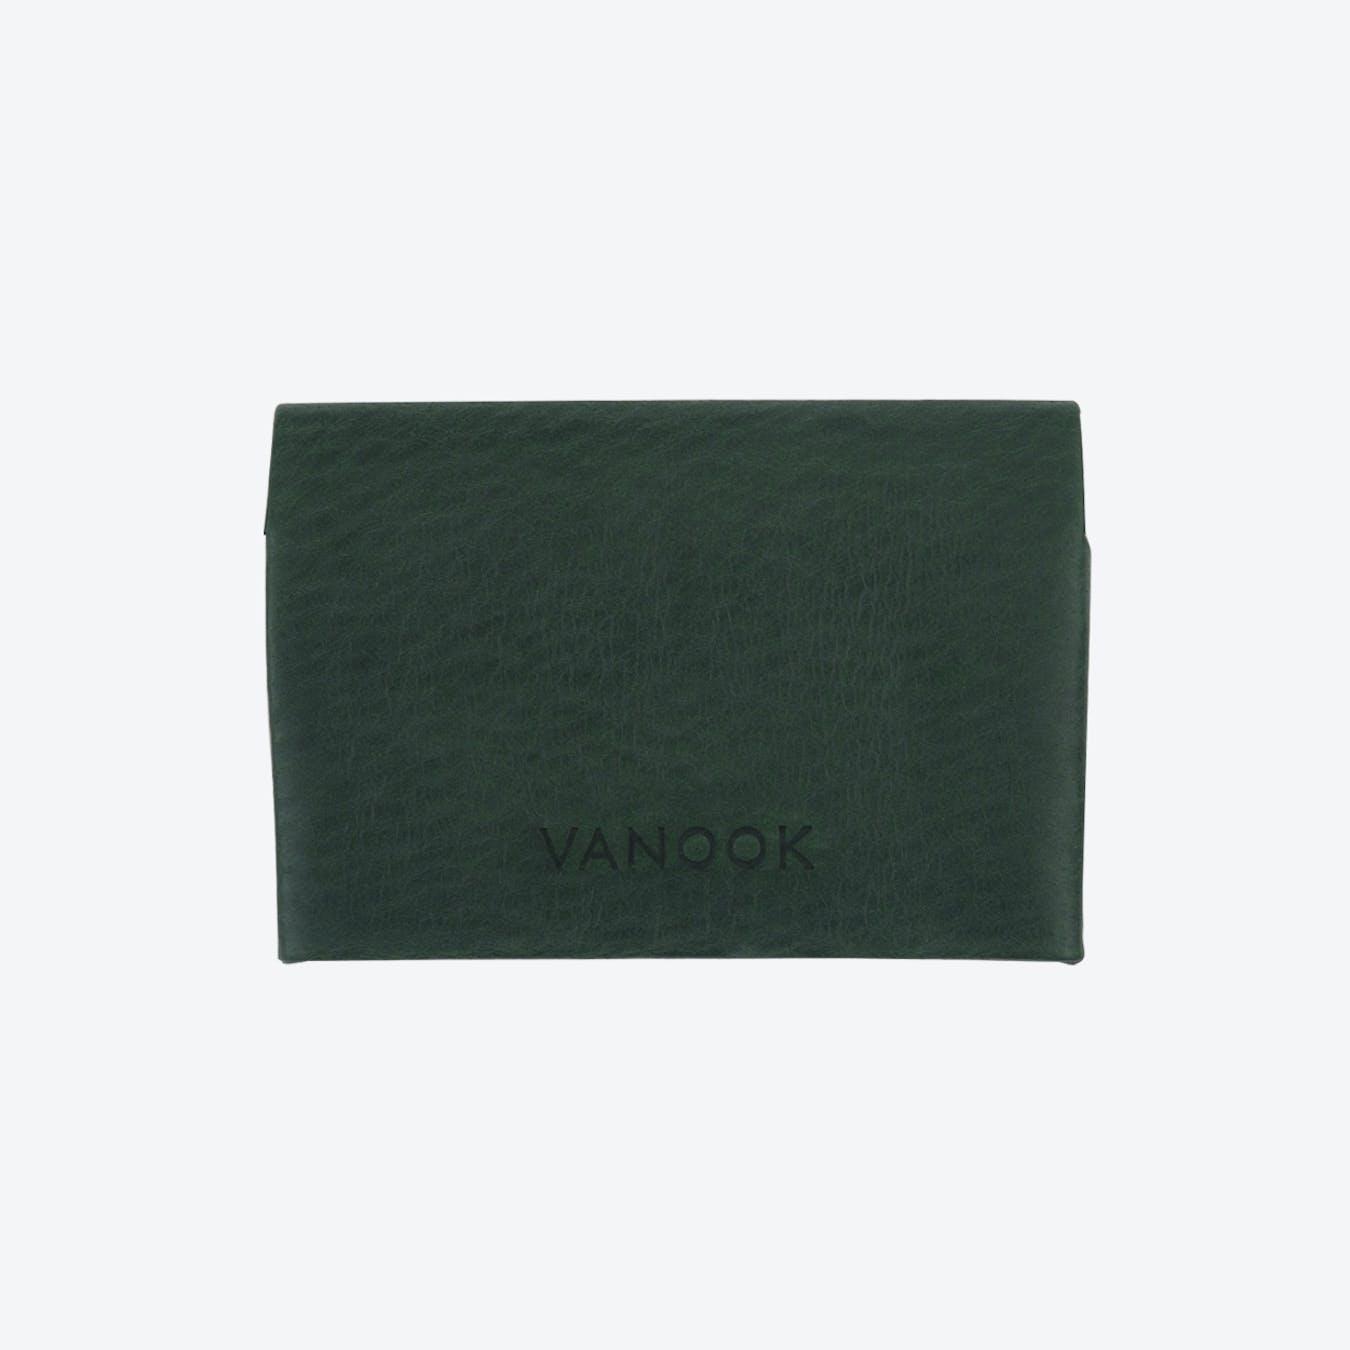 Small Wallet in Malachite